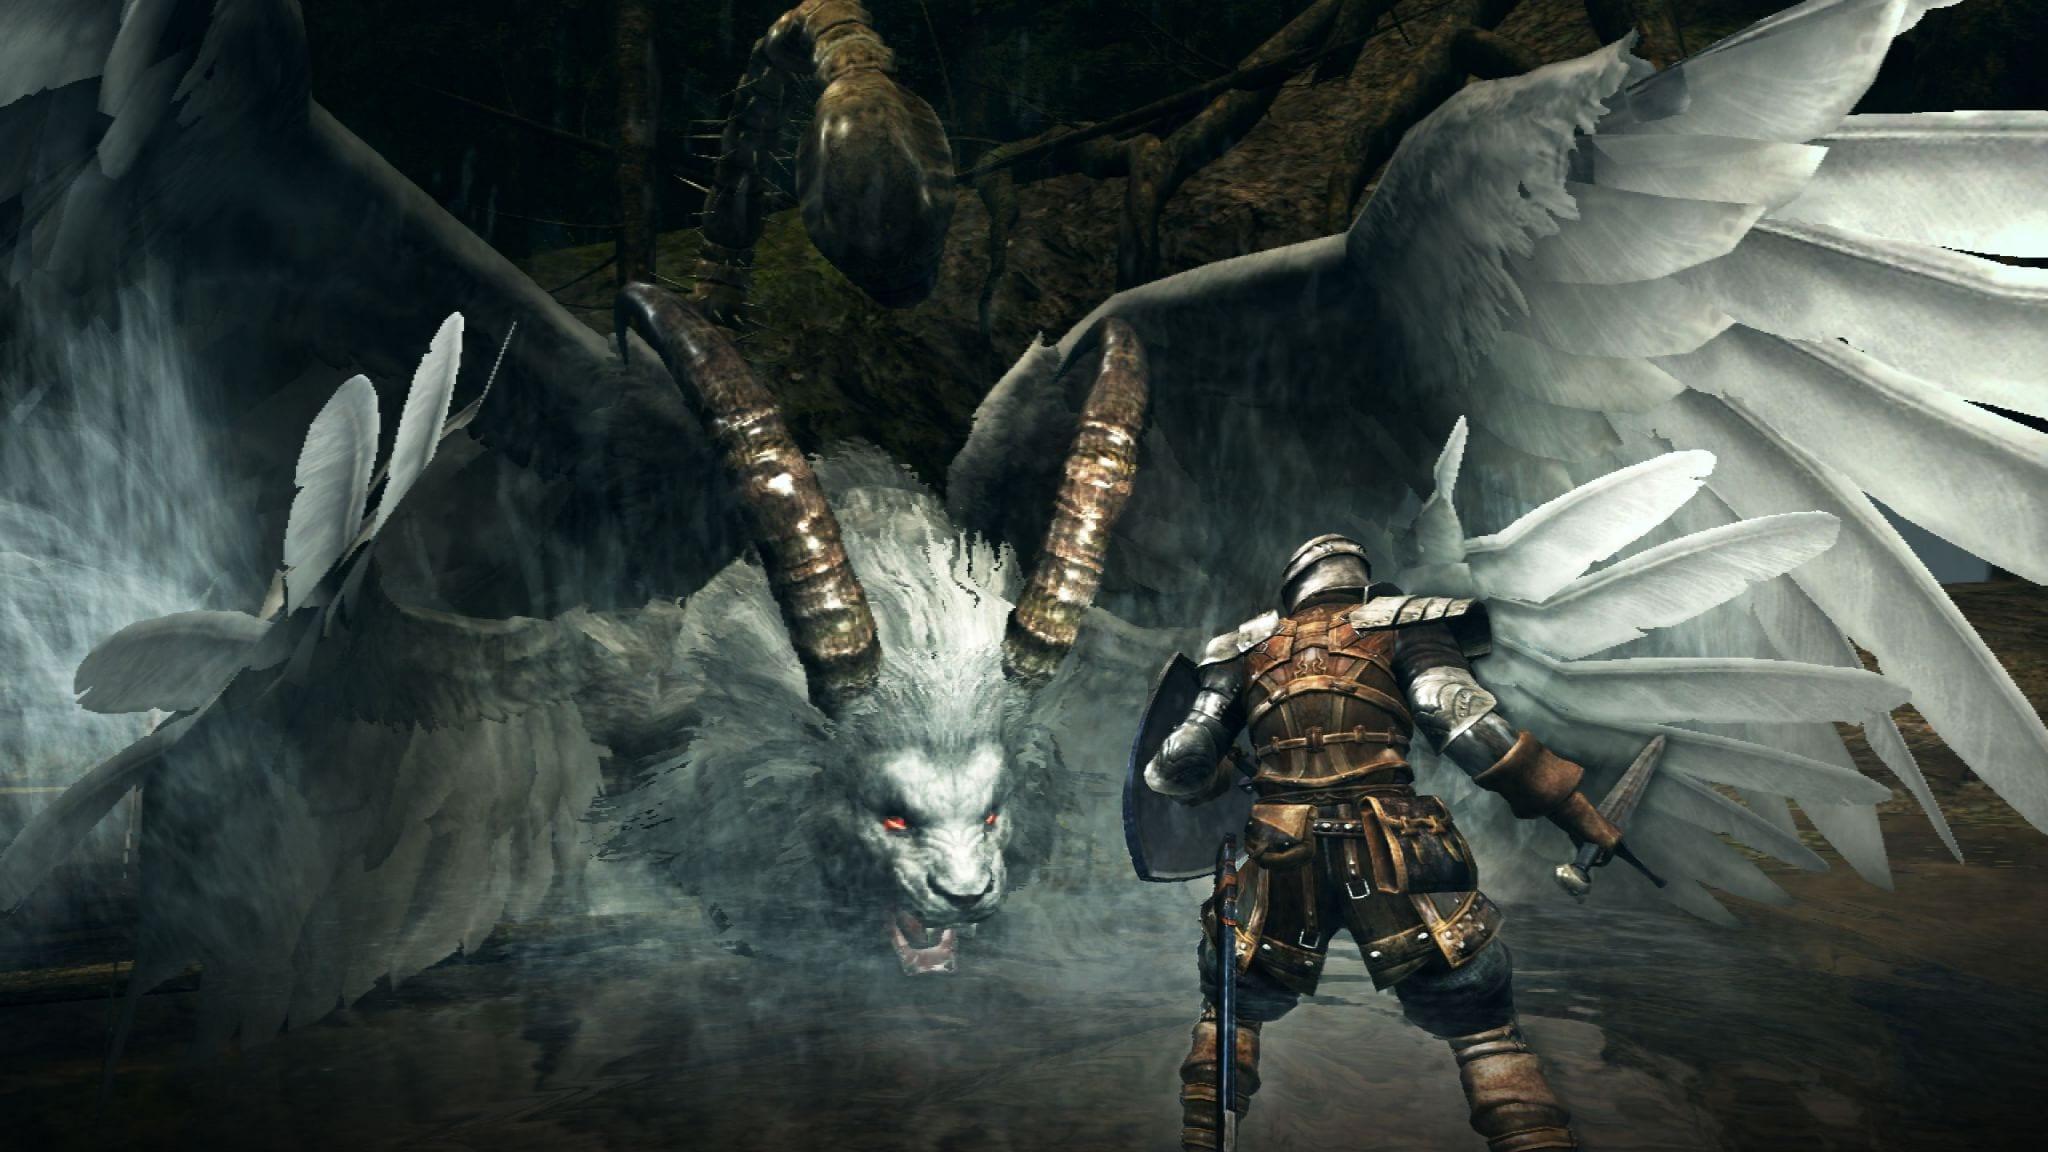 Dark Souls online still not fully functional admits Namco